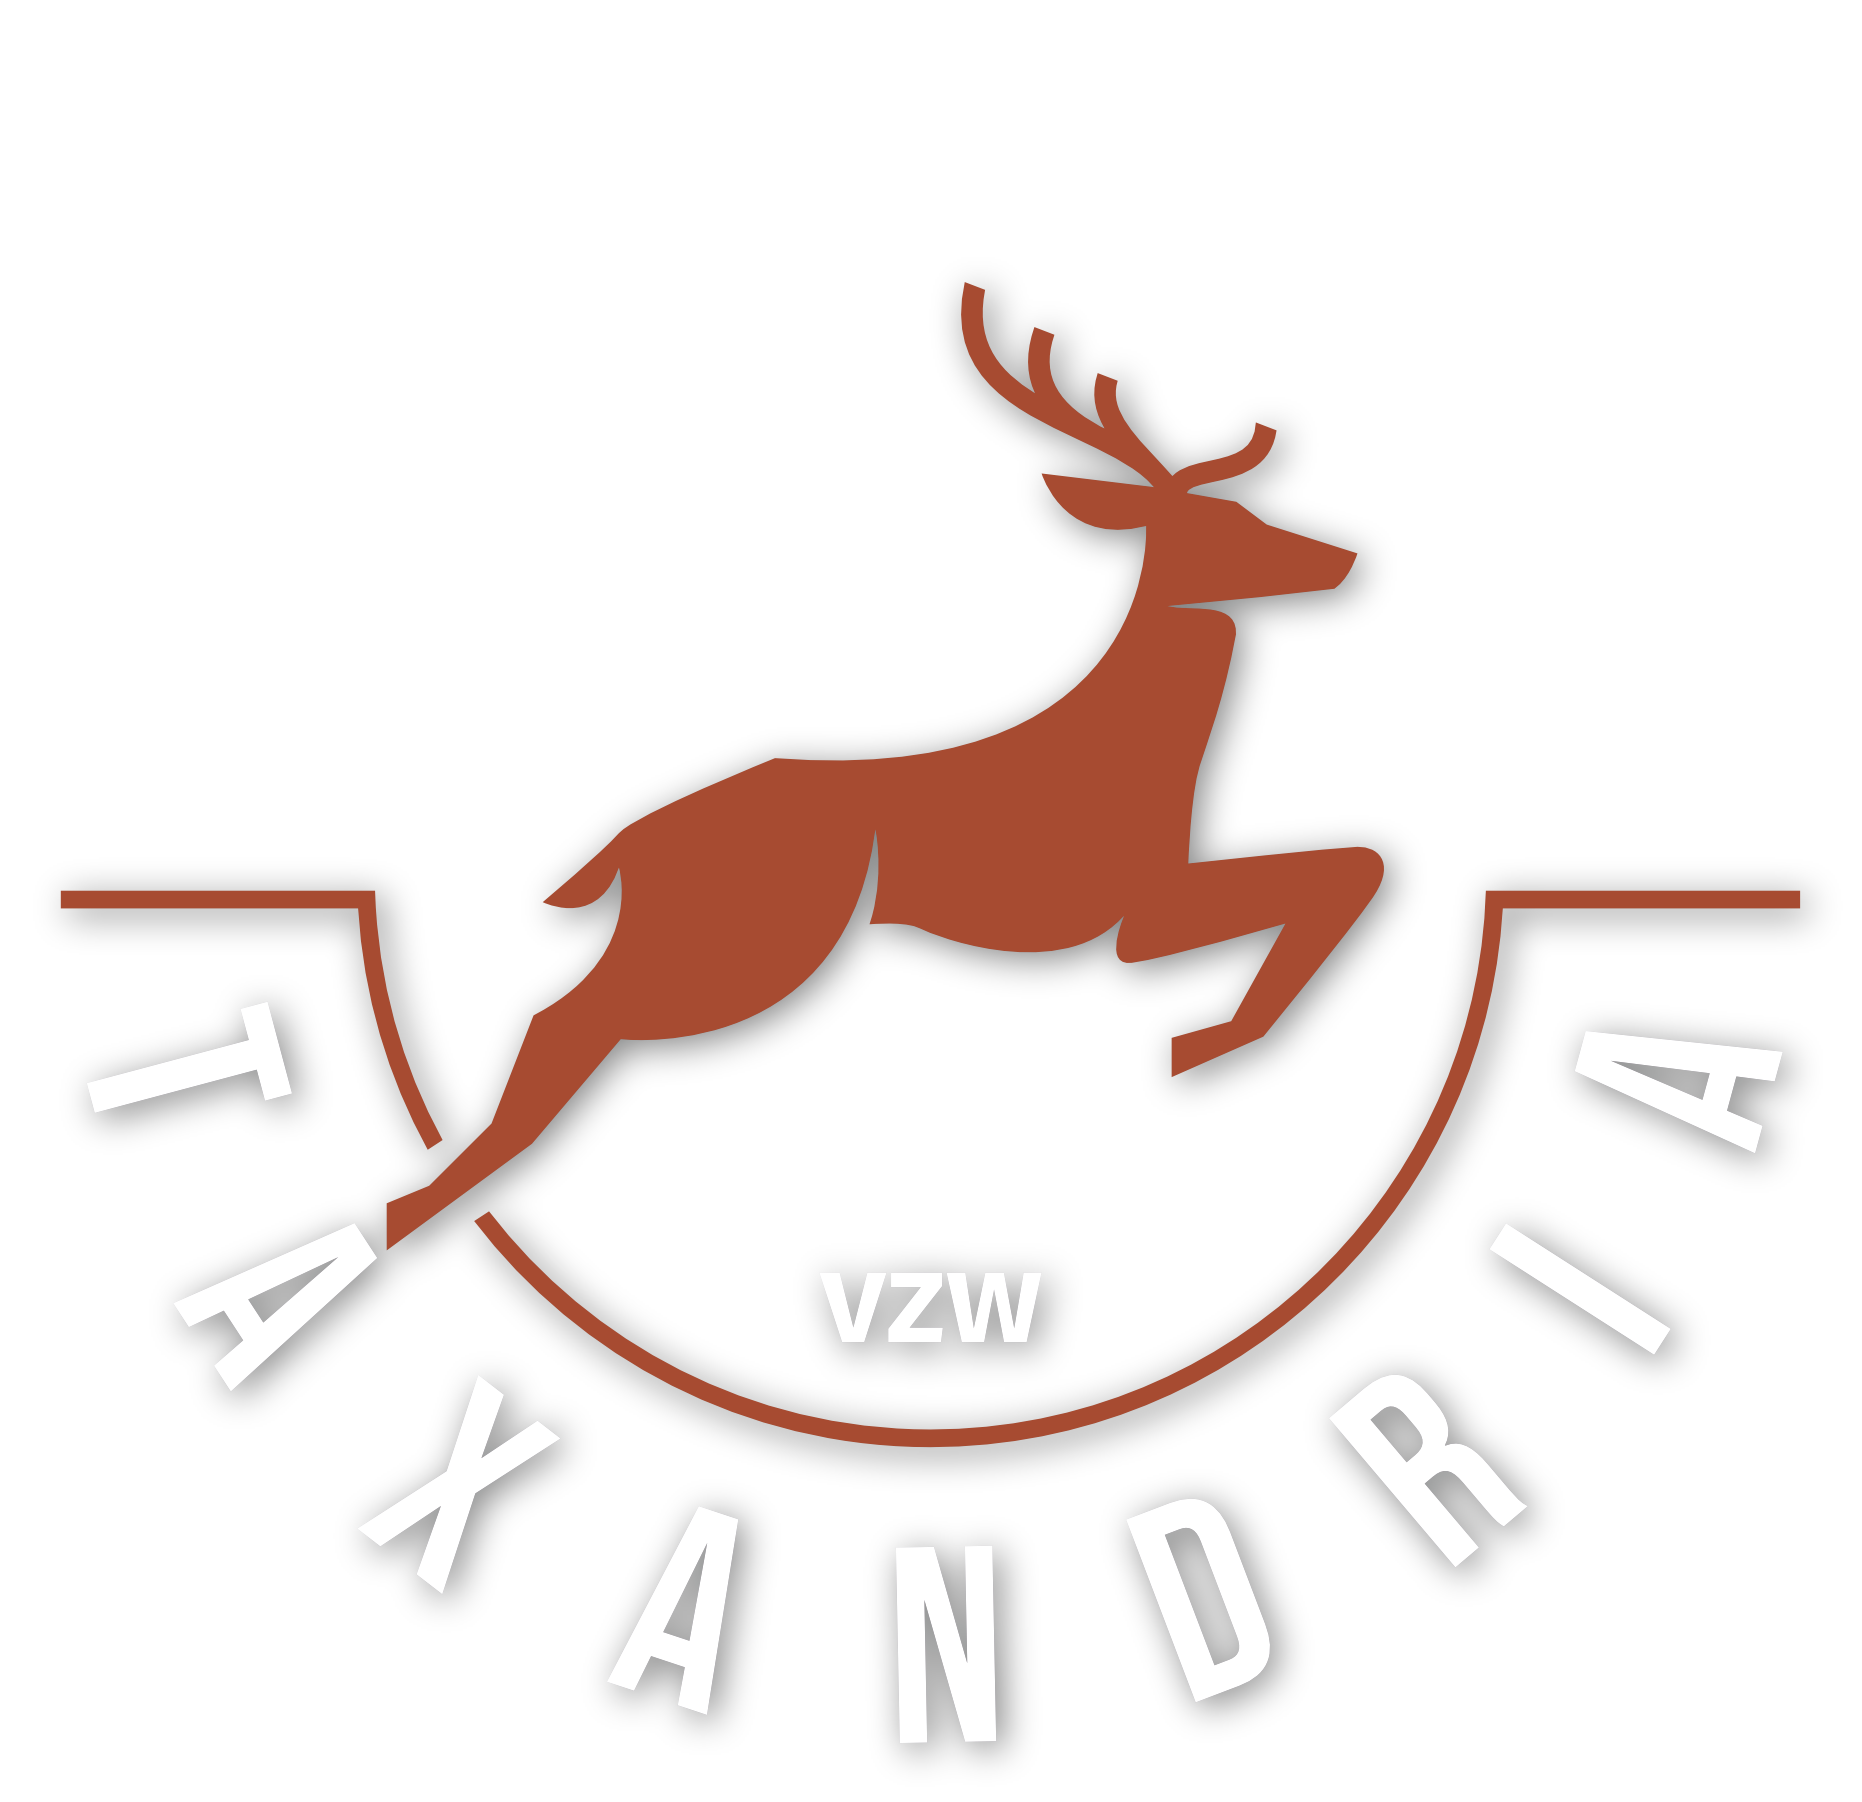 Taxandria VZW